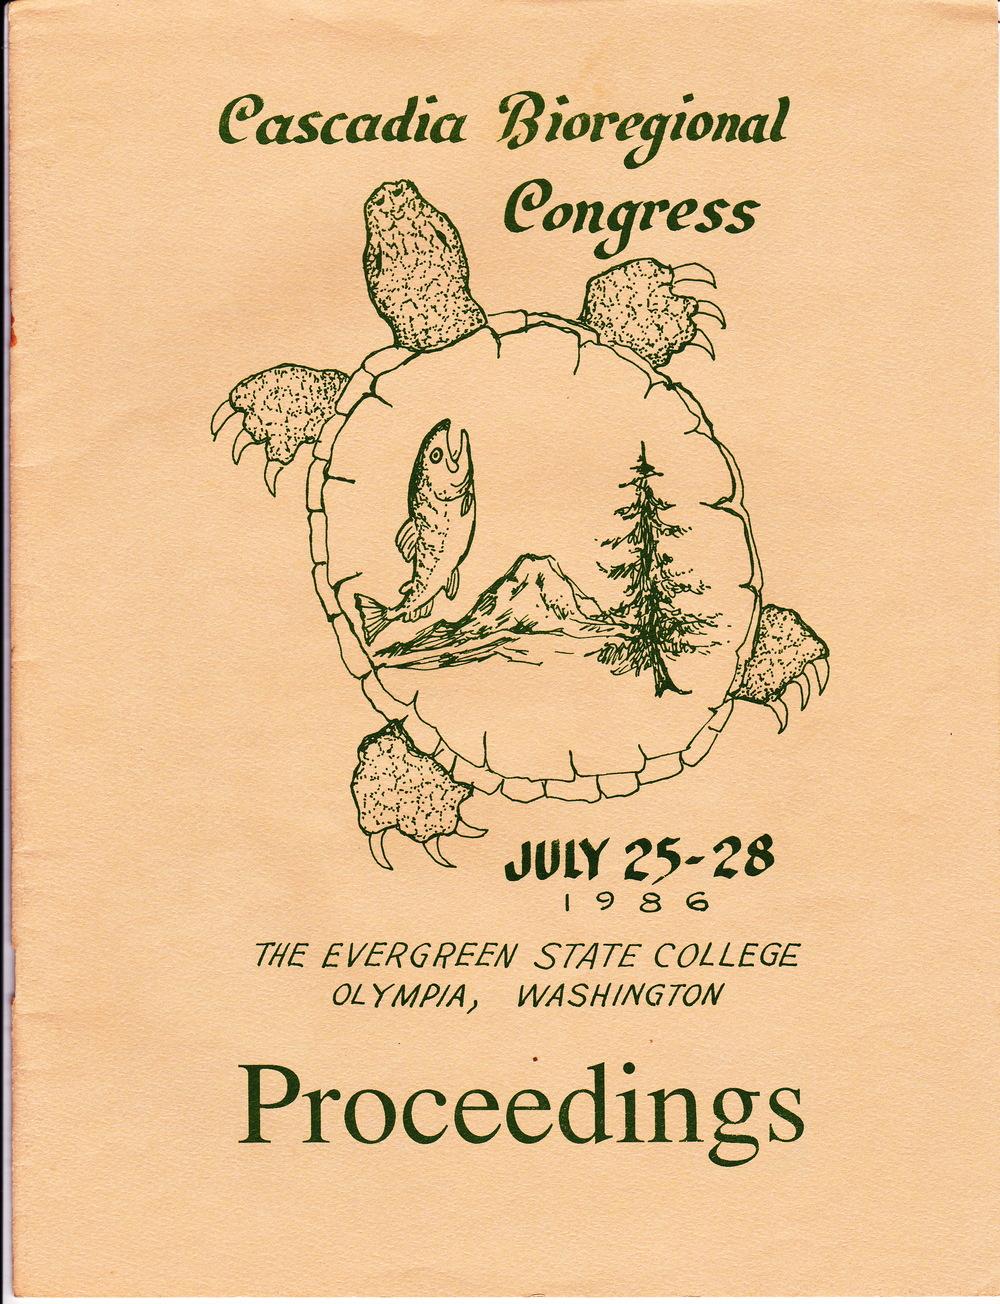 Cascadia Bioregional Congress 1986 Proceedings.jpg